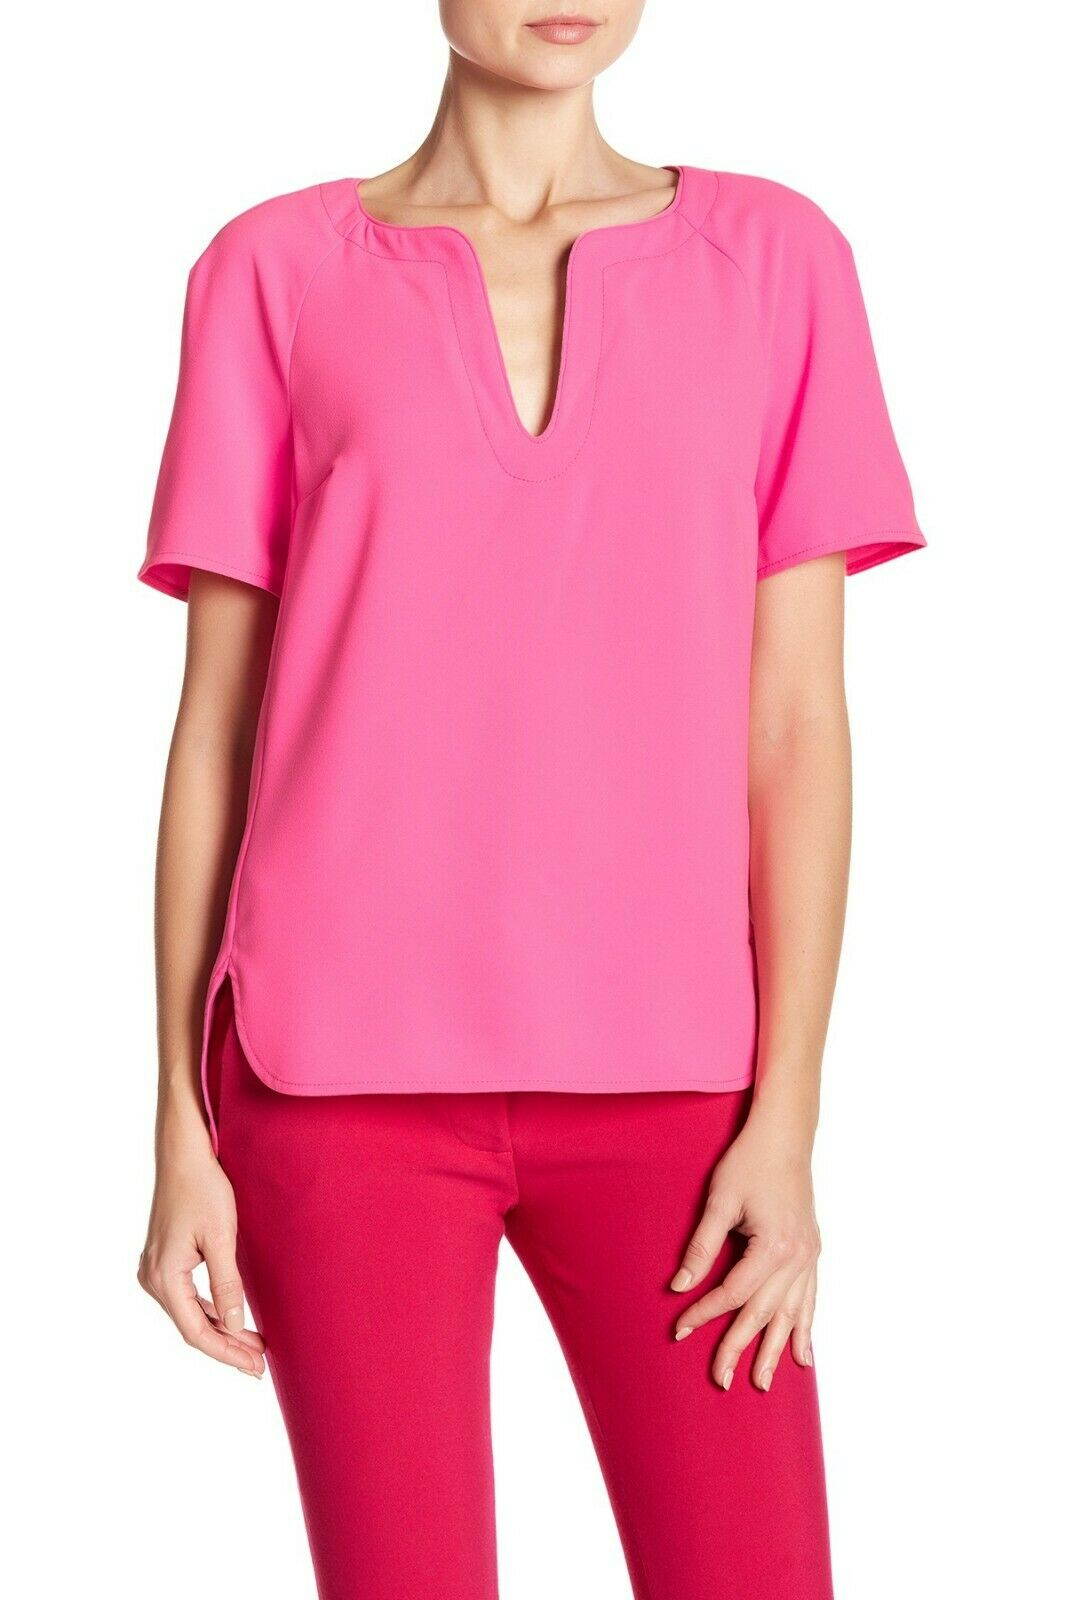 NWT- Trina Turk Pearle Split-Neck Short Sleeve Top, Gemini Rosa - Größe XSmall